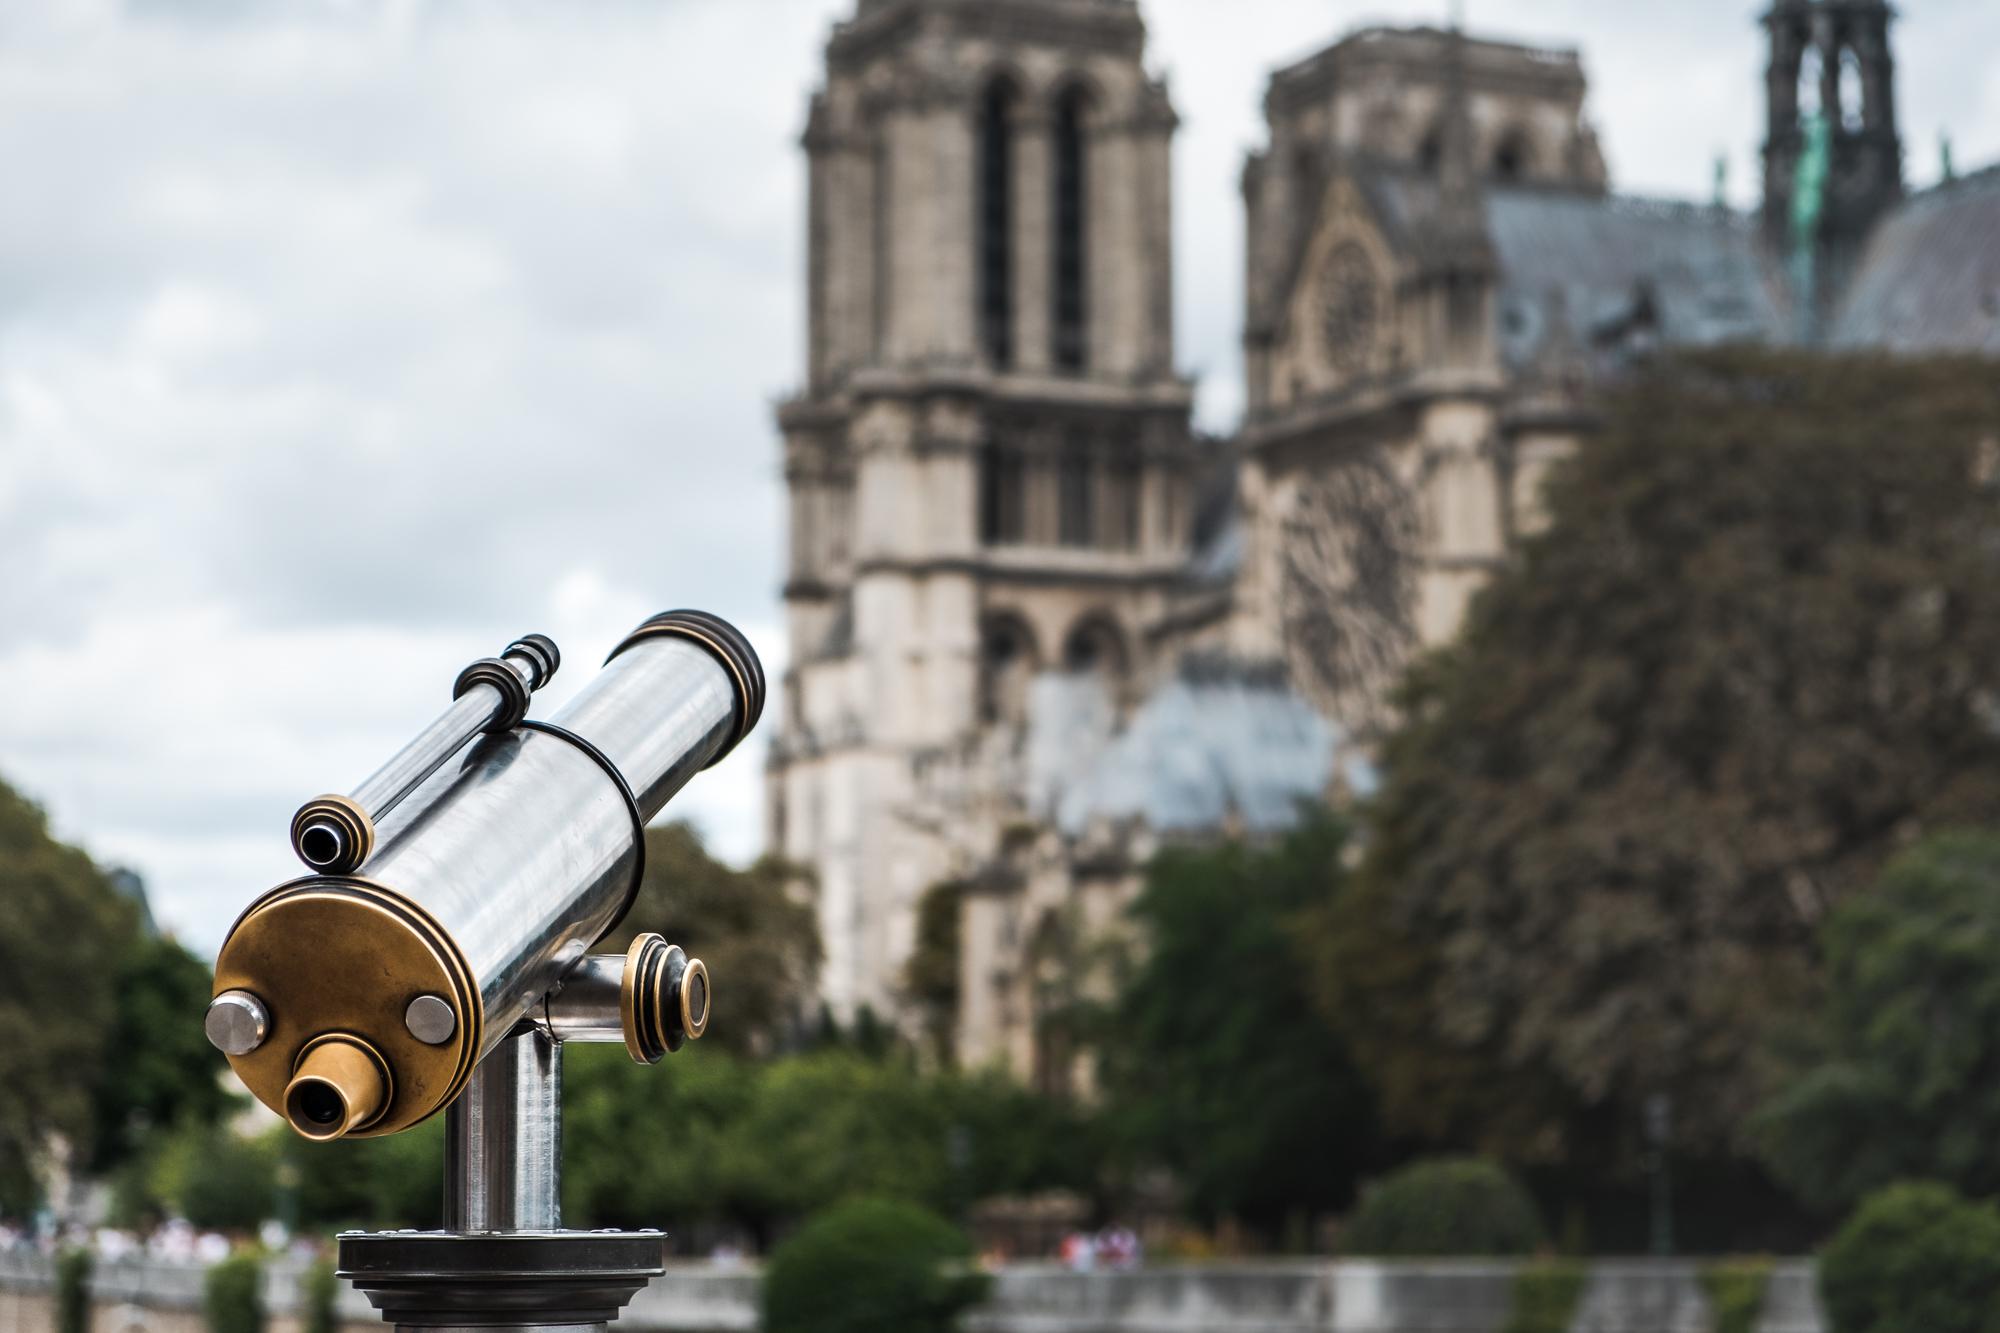 TS -180730 - Paris - 005.jpg